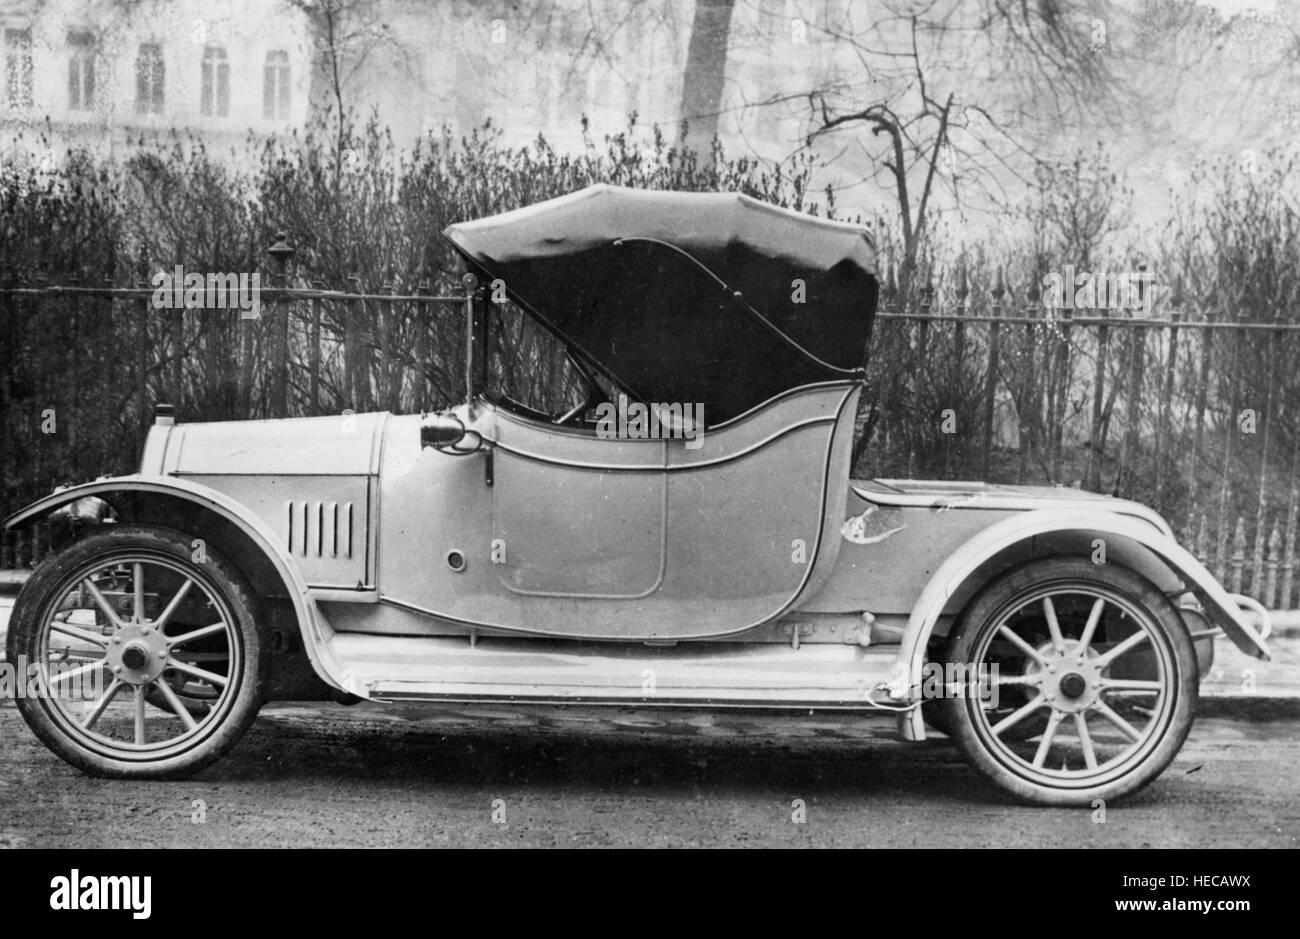 1910 Hillman 12/15hp - Stock Image